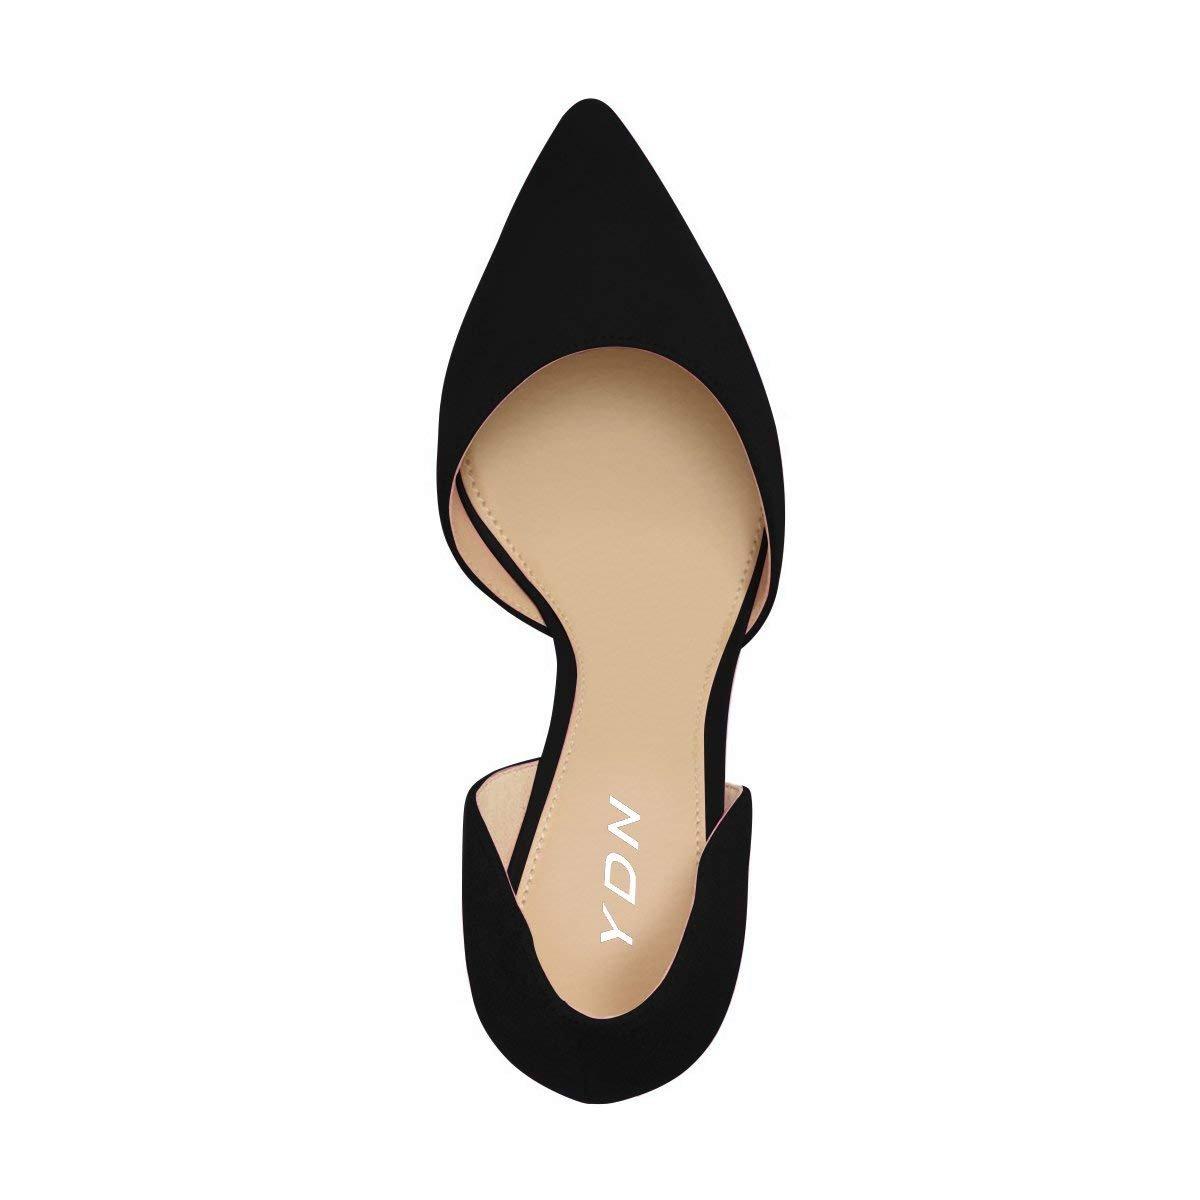 YDN Women Classic Low Heels Toe D'Orsay Pumps Suede Pointed Toe Heels Slip On Dressy Stilettos Shoes B0725CFGZ9 8.5 B(M) US Black 34d830